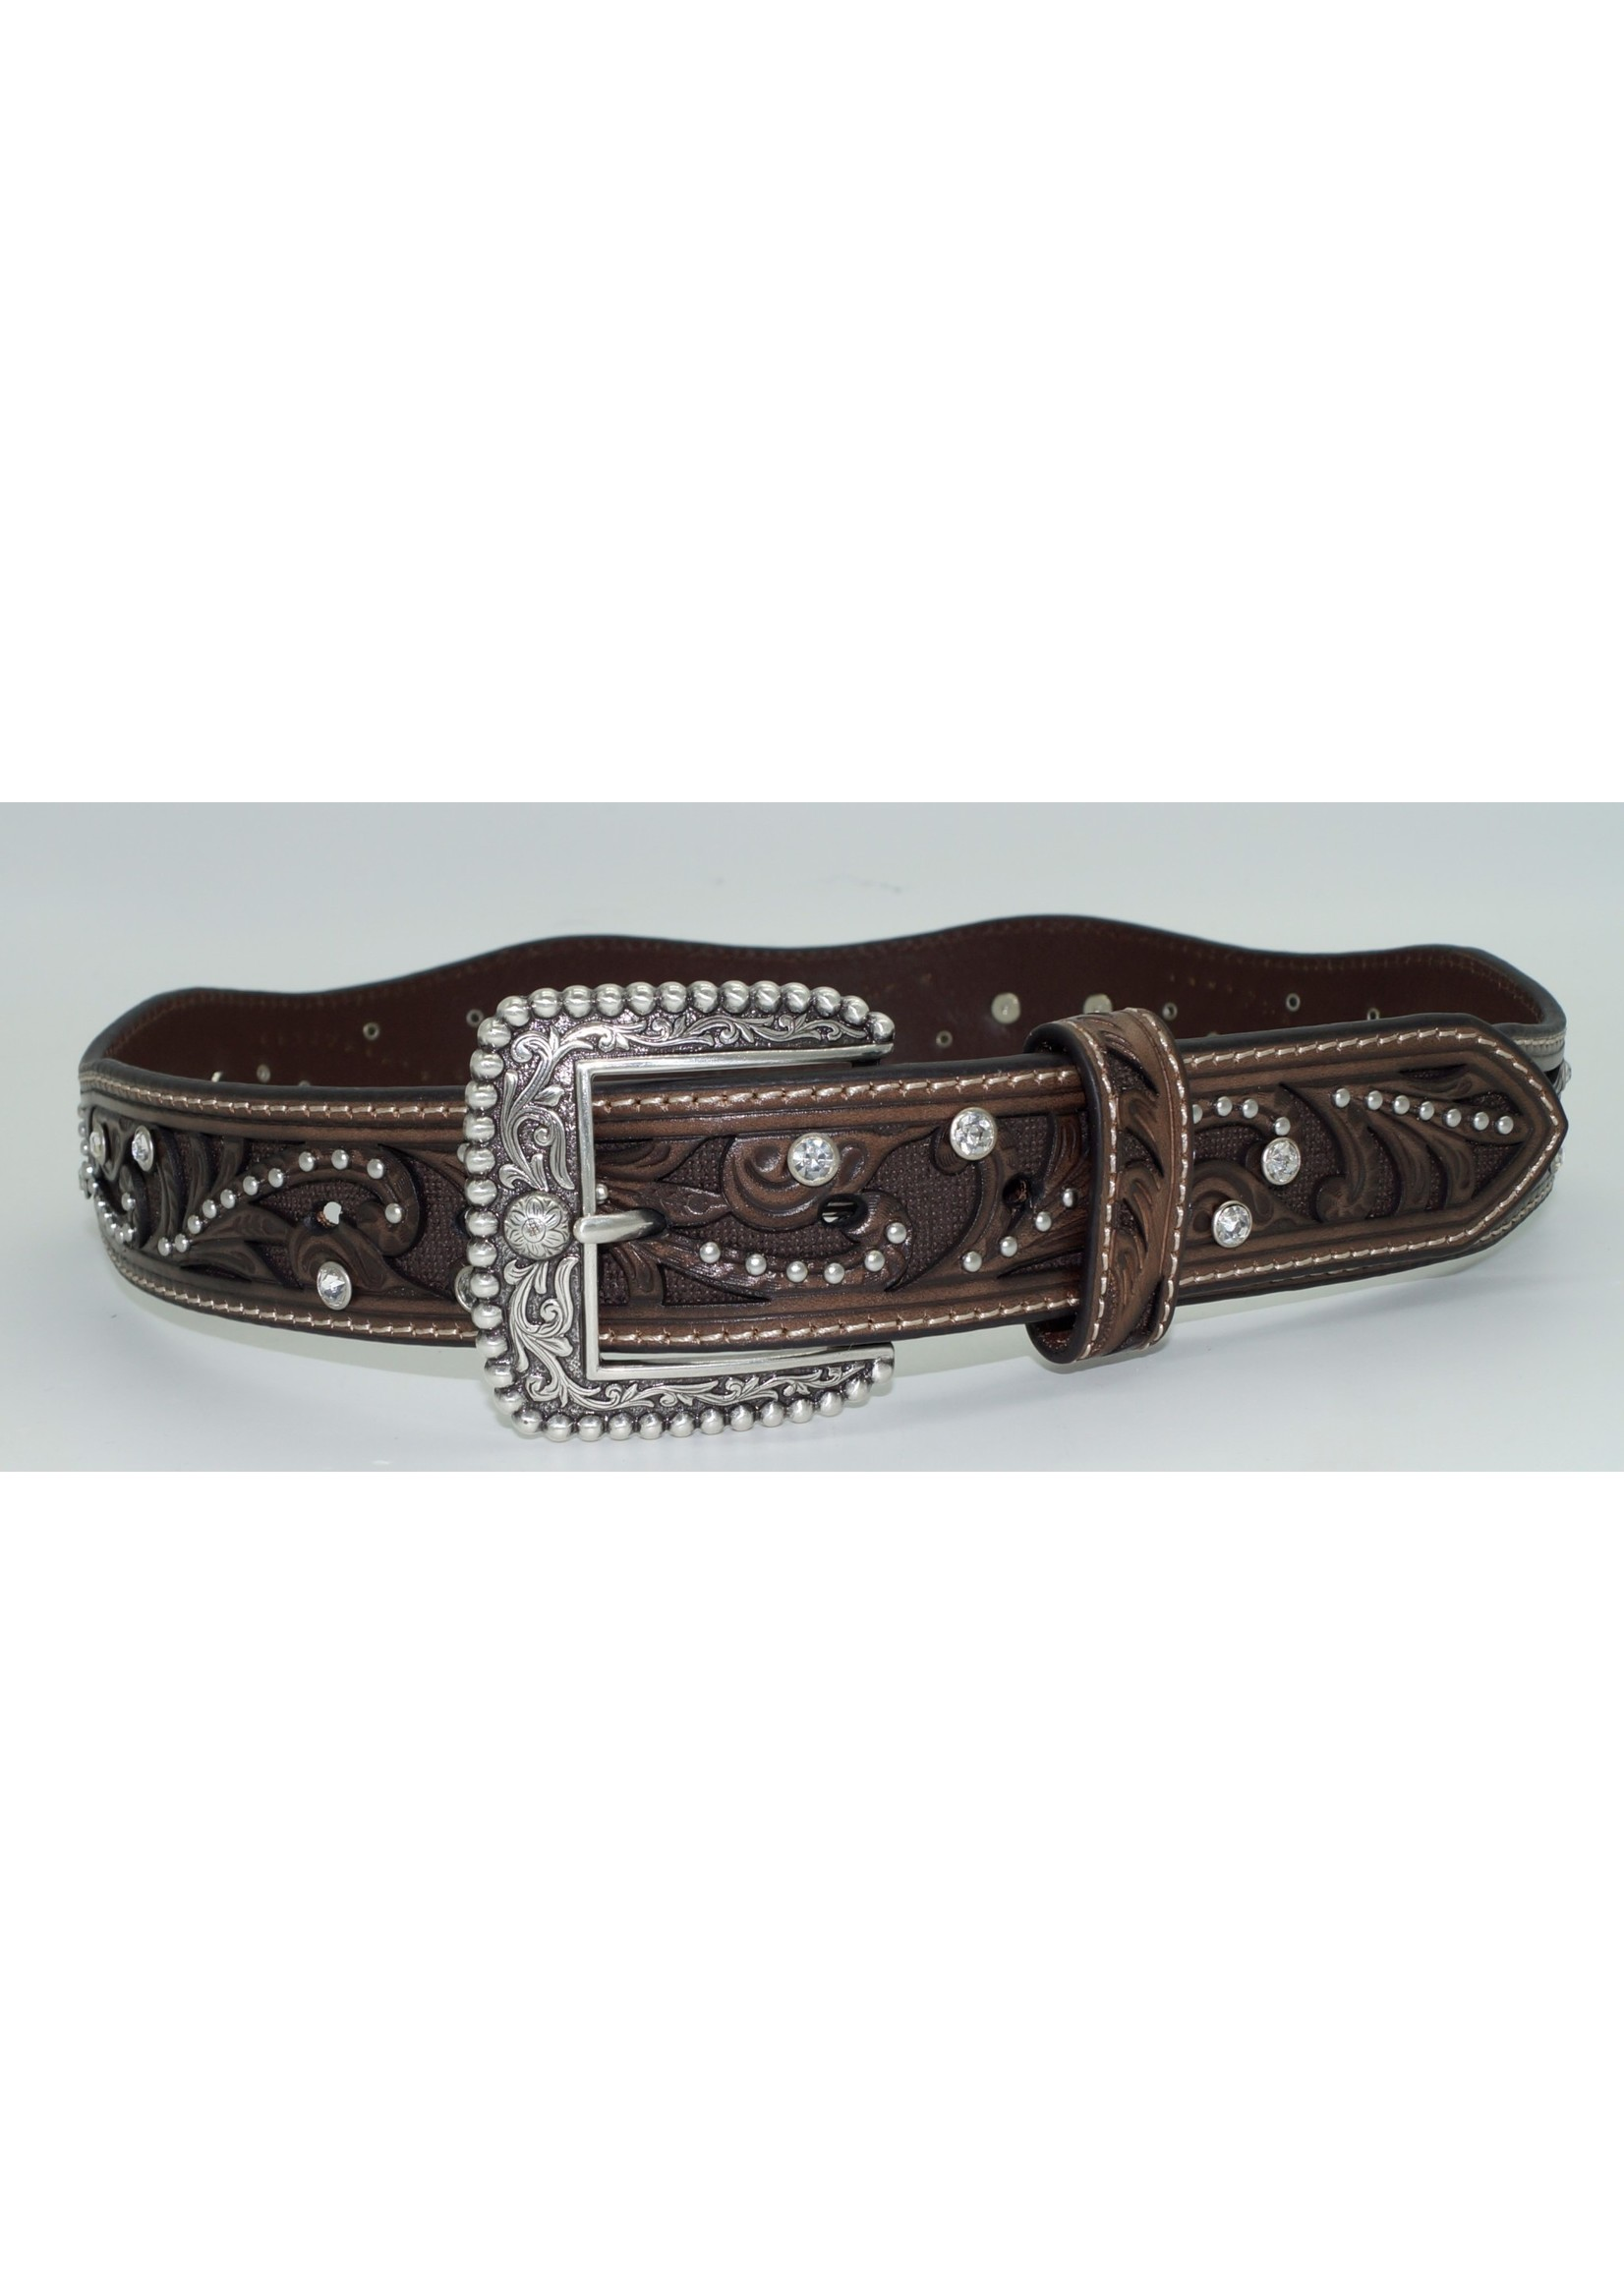 Ariat A1513002-1.5 width Ladies Belt